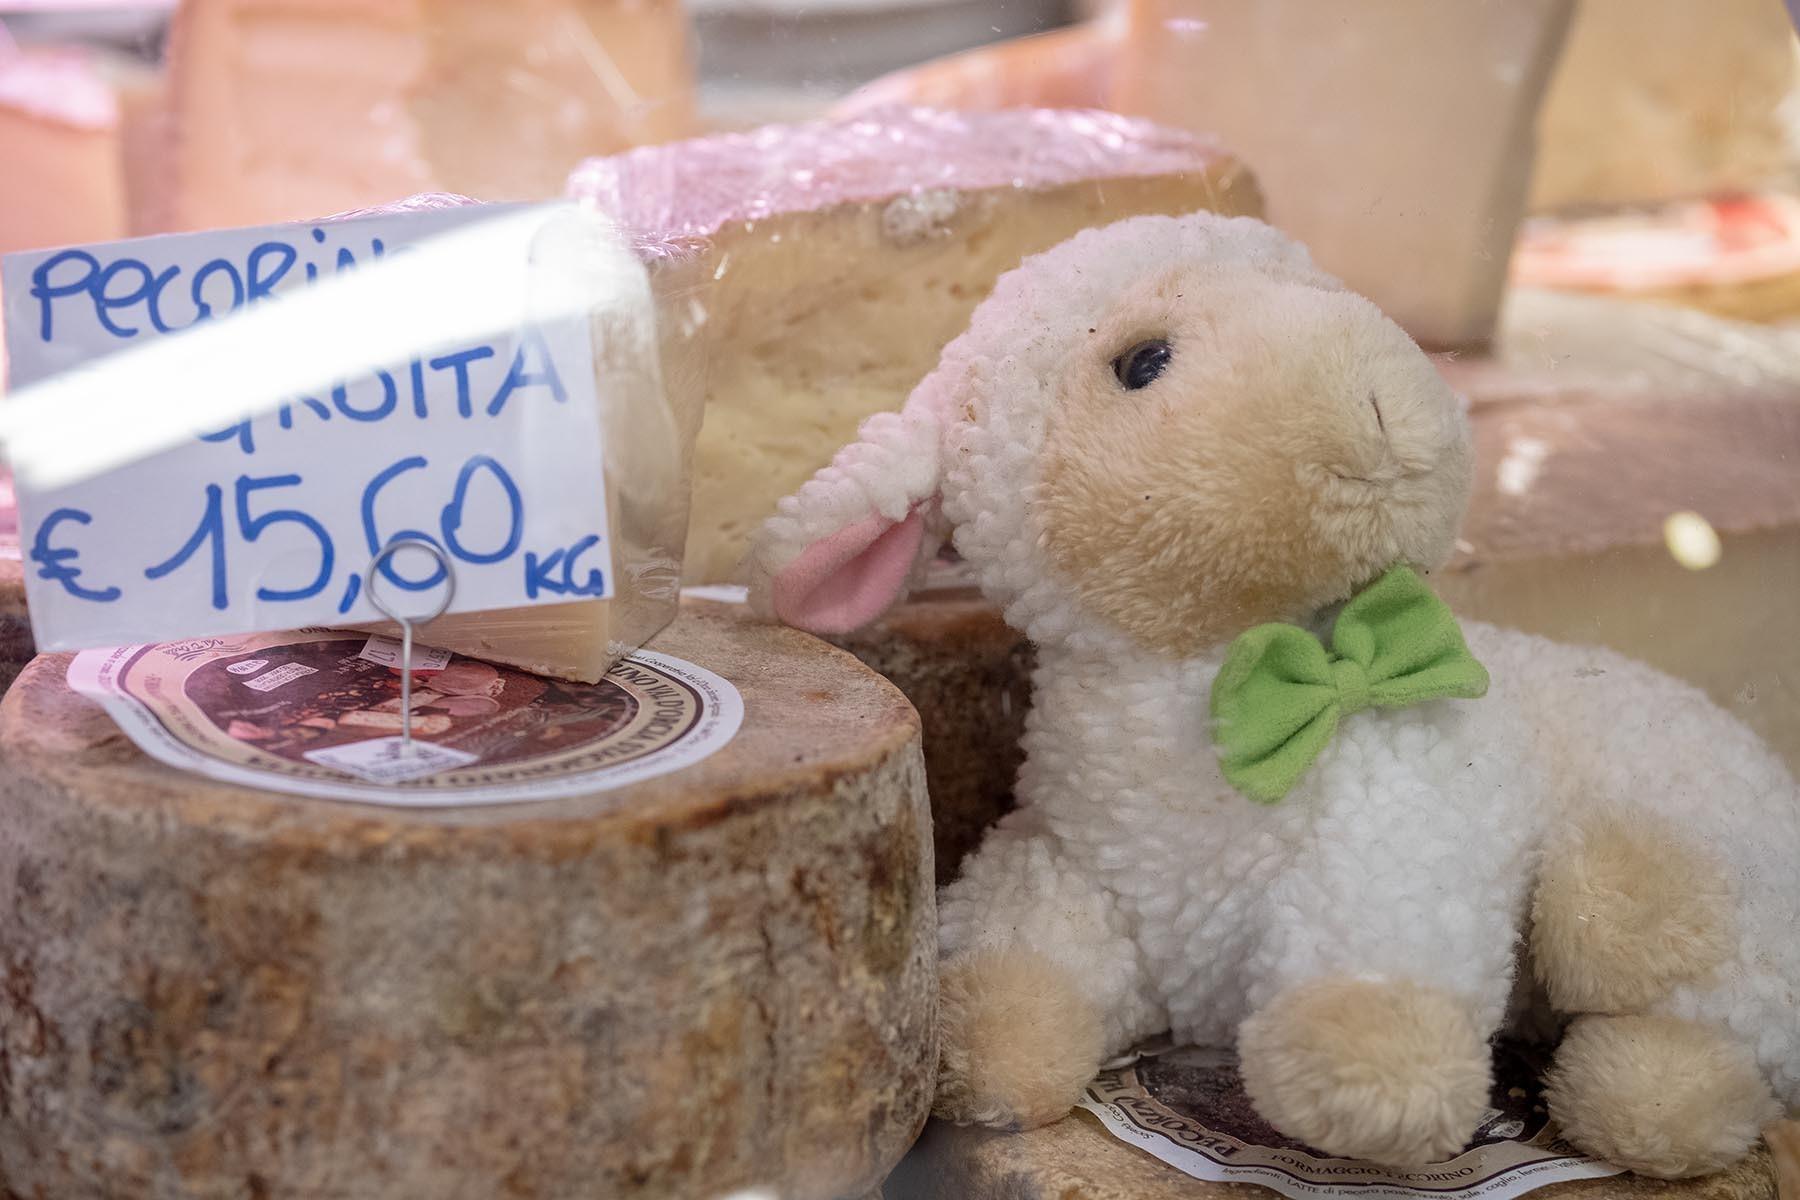 Ser pecorino i owieczka - wystrój sklapu Mercato Centra;e we Florencji